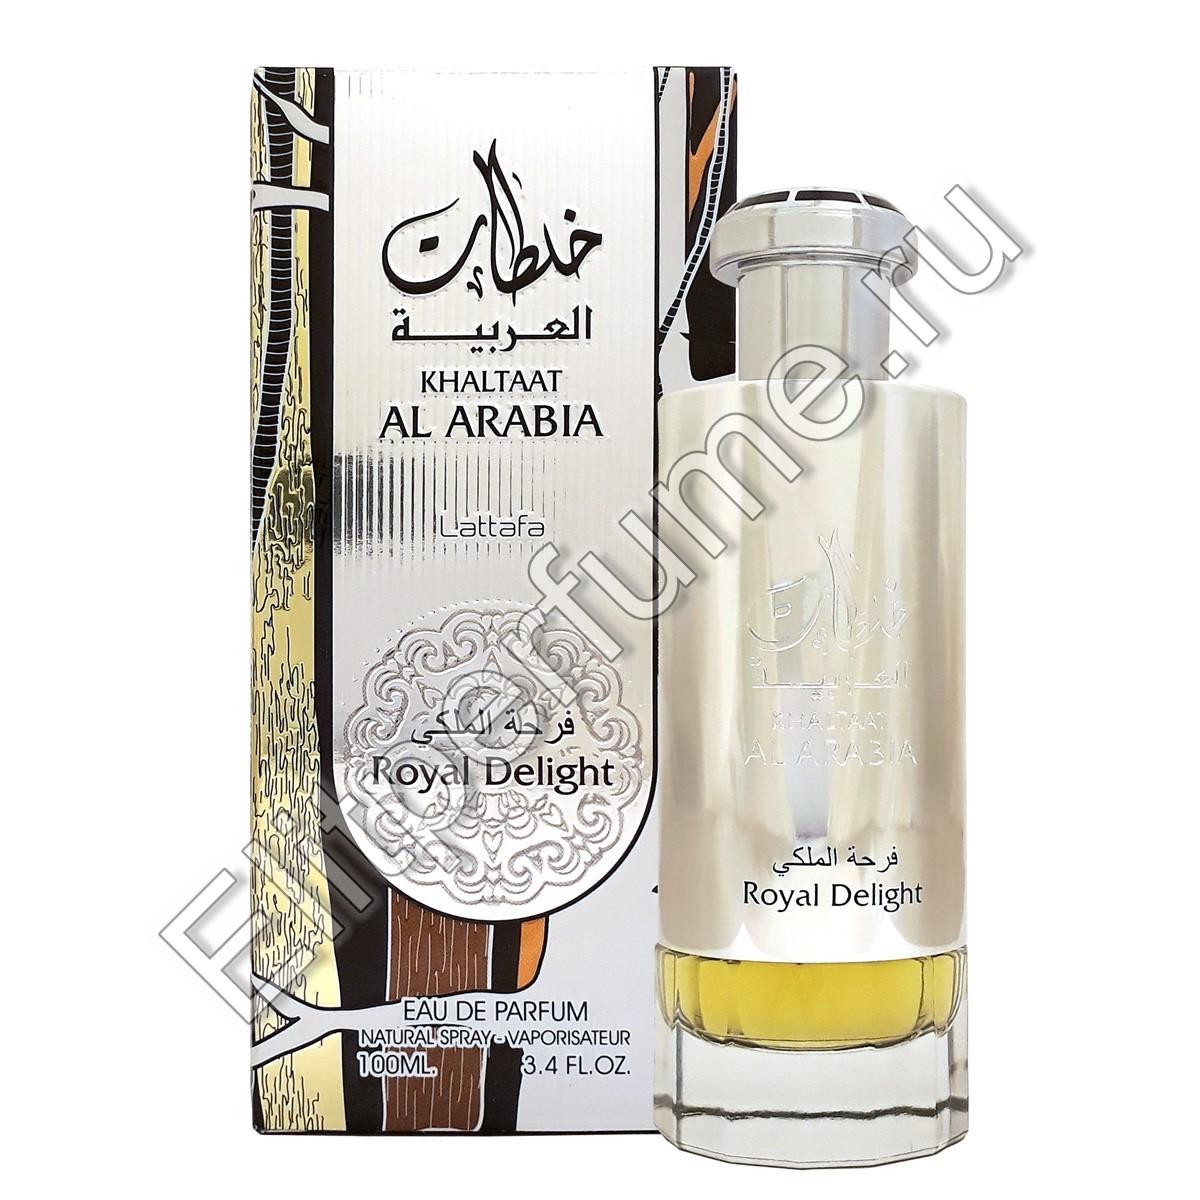 Khaltaat Al Arabia Royal Delight u EDP 100 мл спрей от Lattafa Латтафа